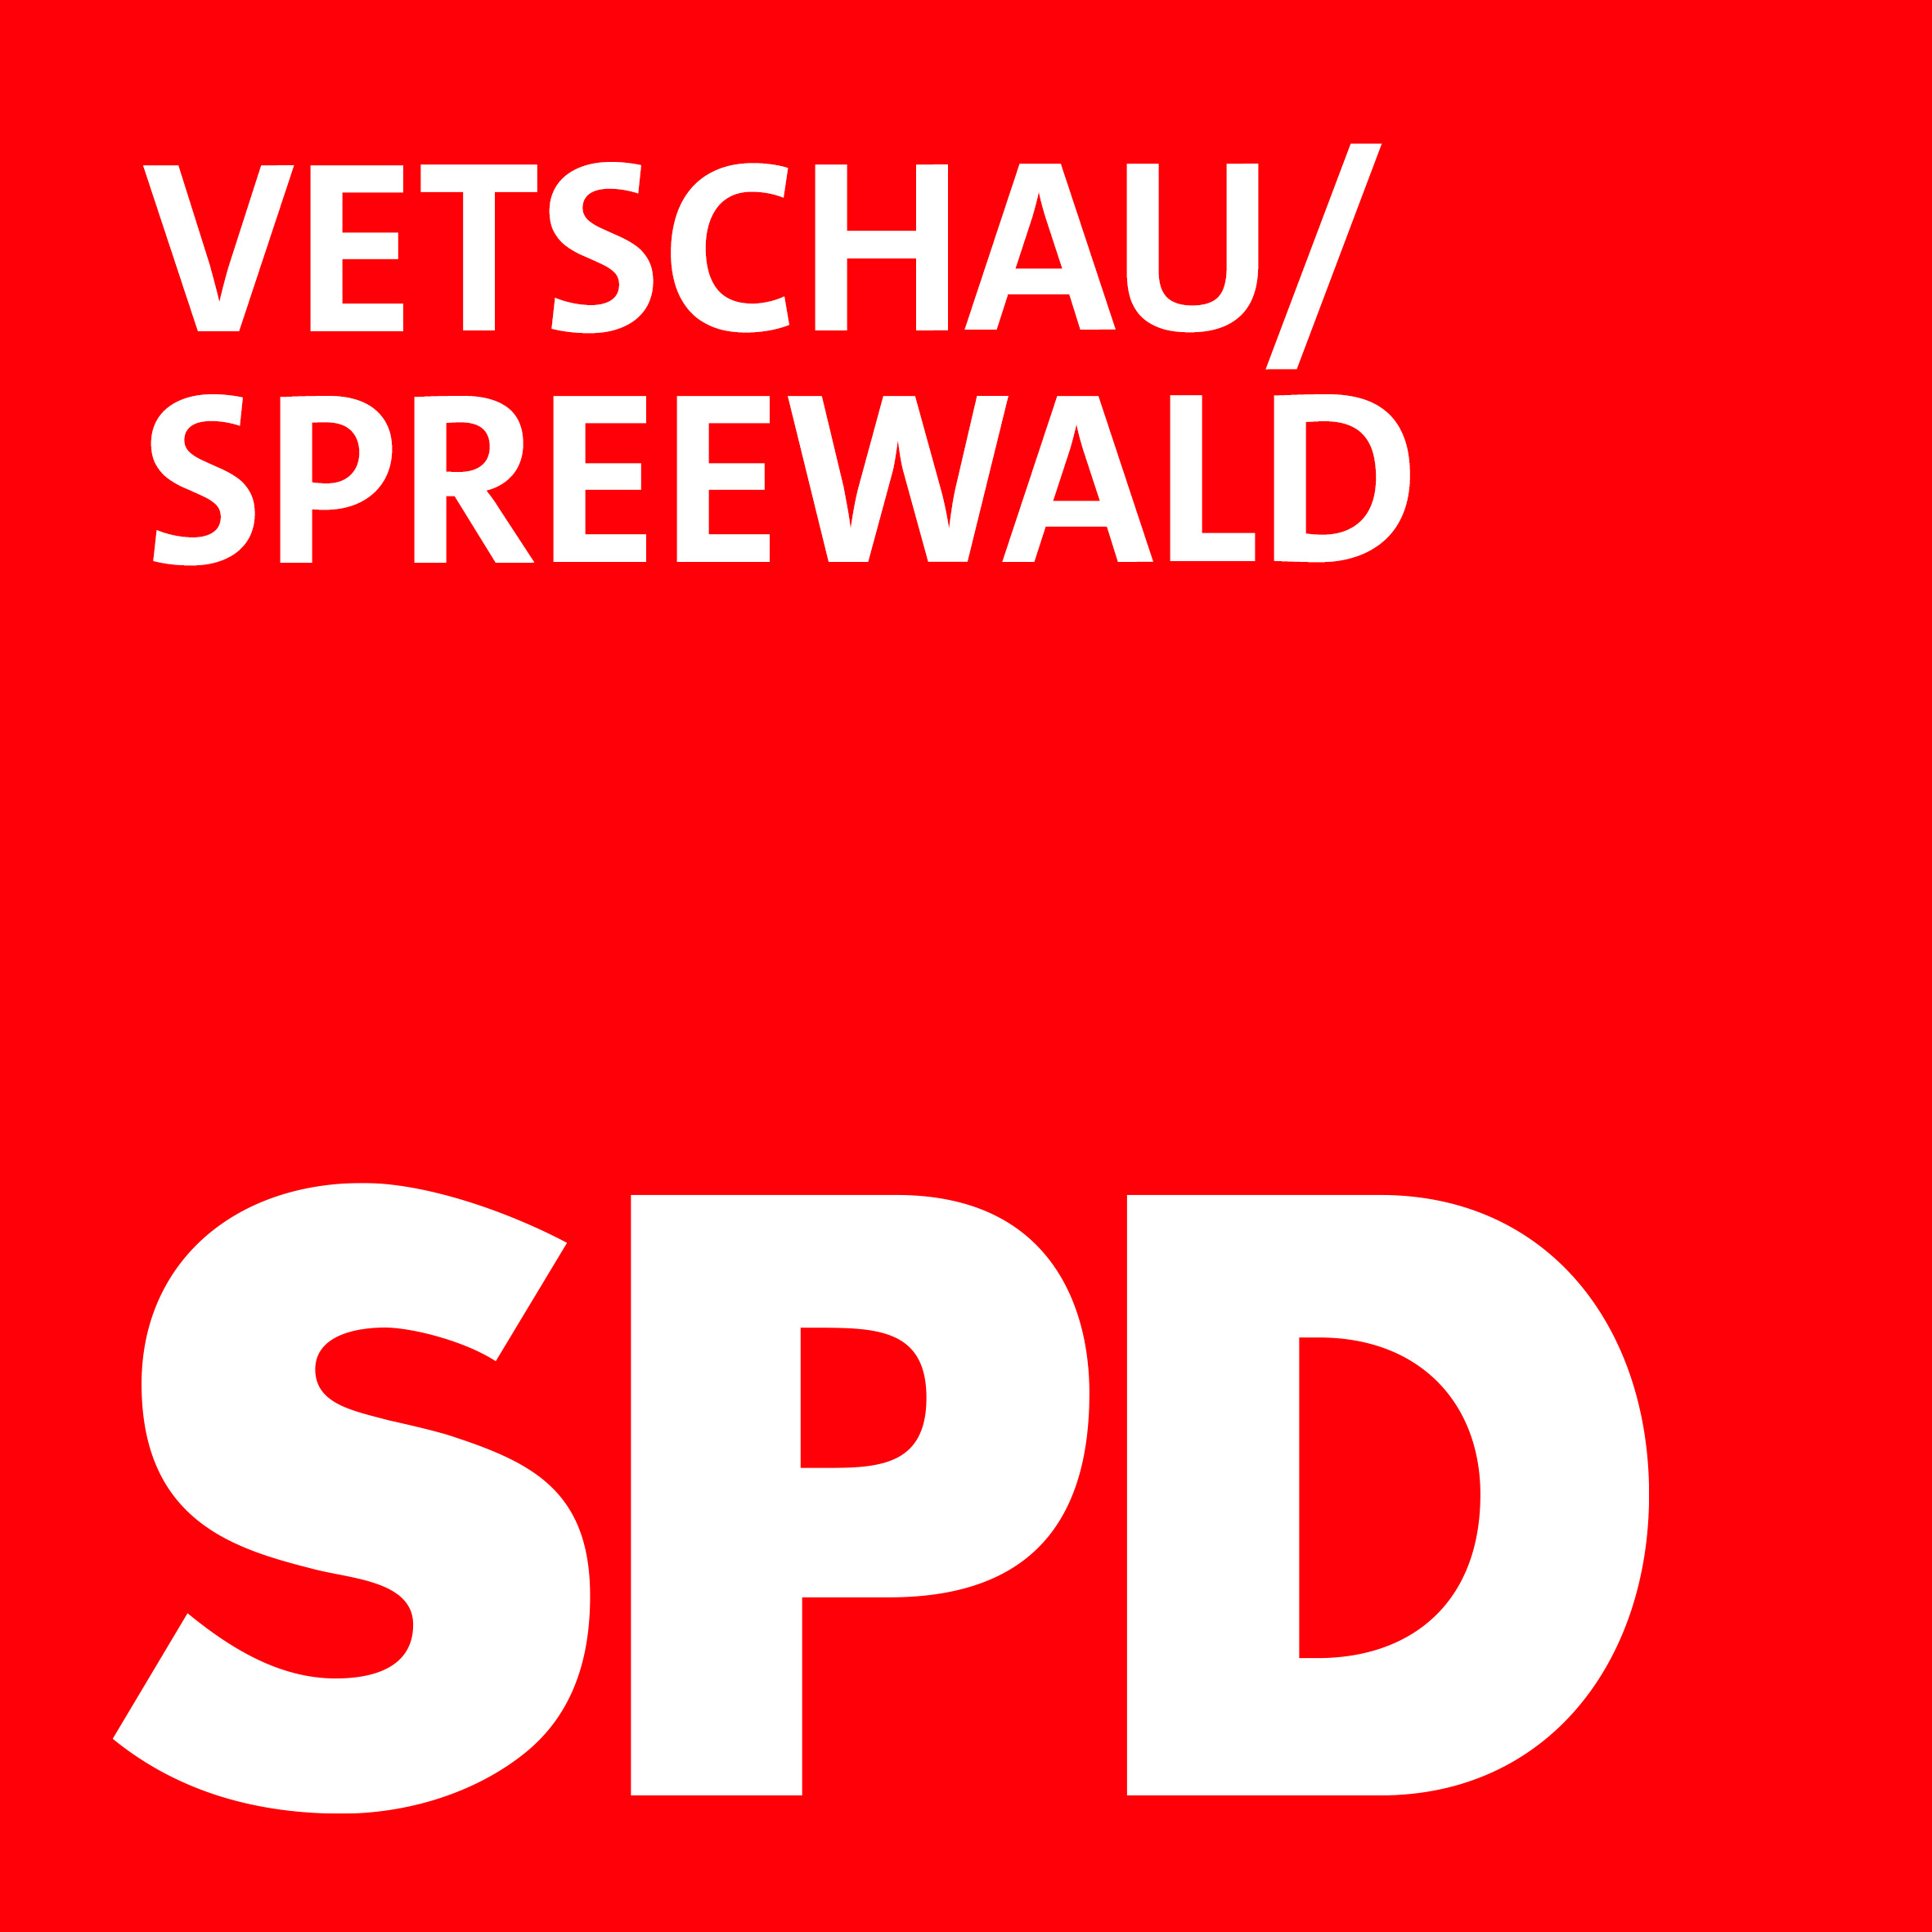 SPD Vetschau/Spreewald